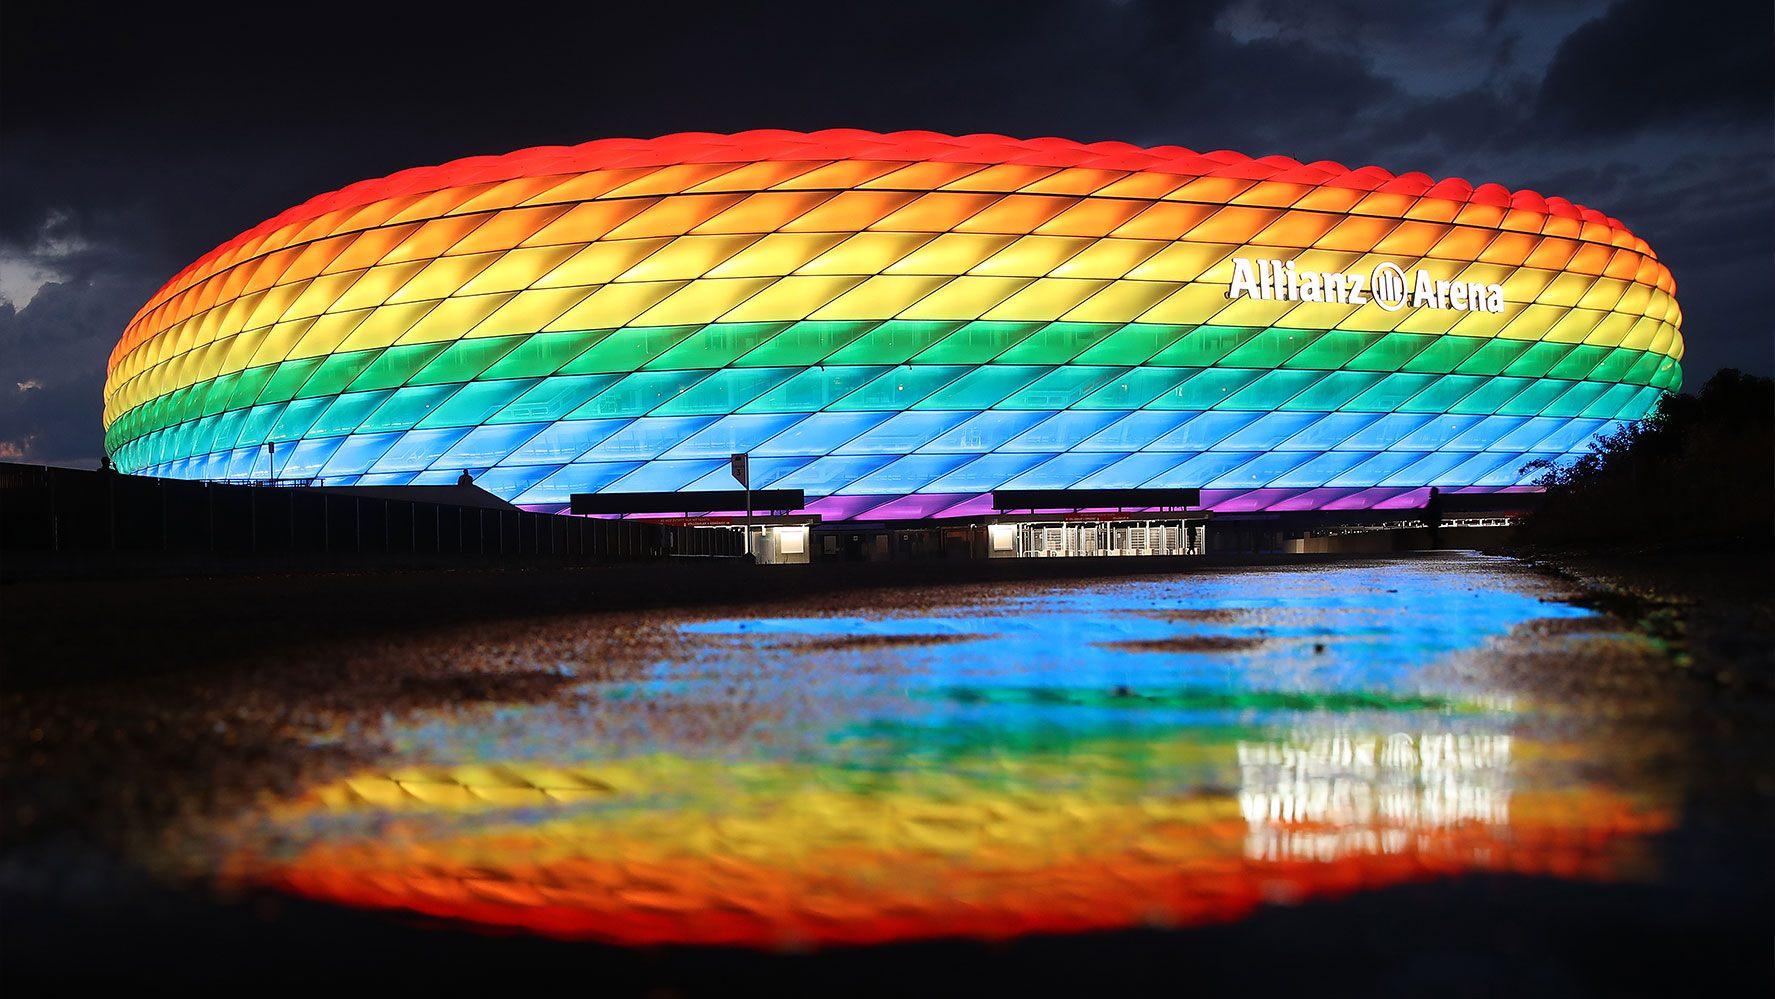 FM Szijjártó Praises UEFA for Declining Munich's Rainbow Stadium 'Provocation'